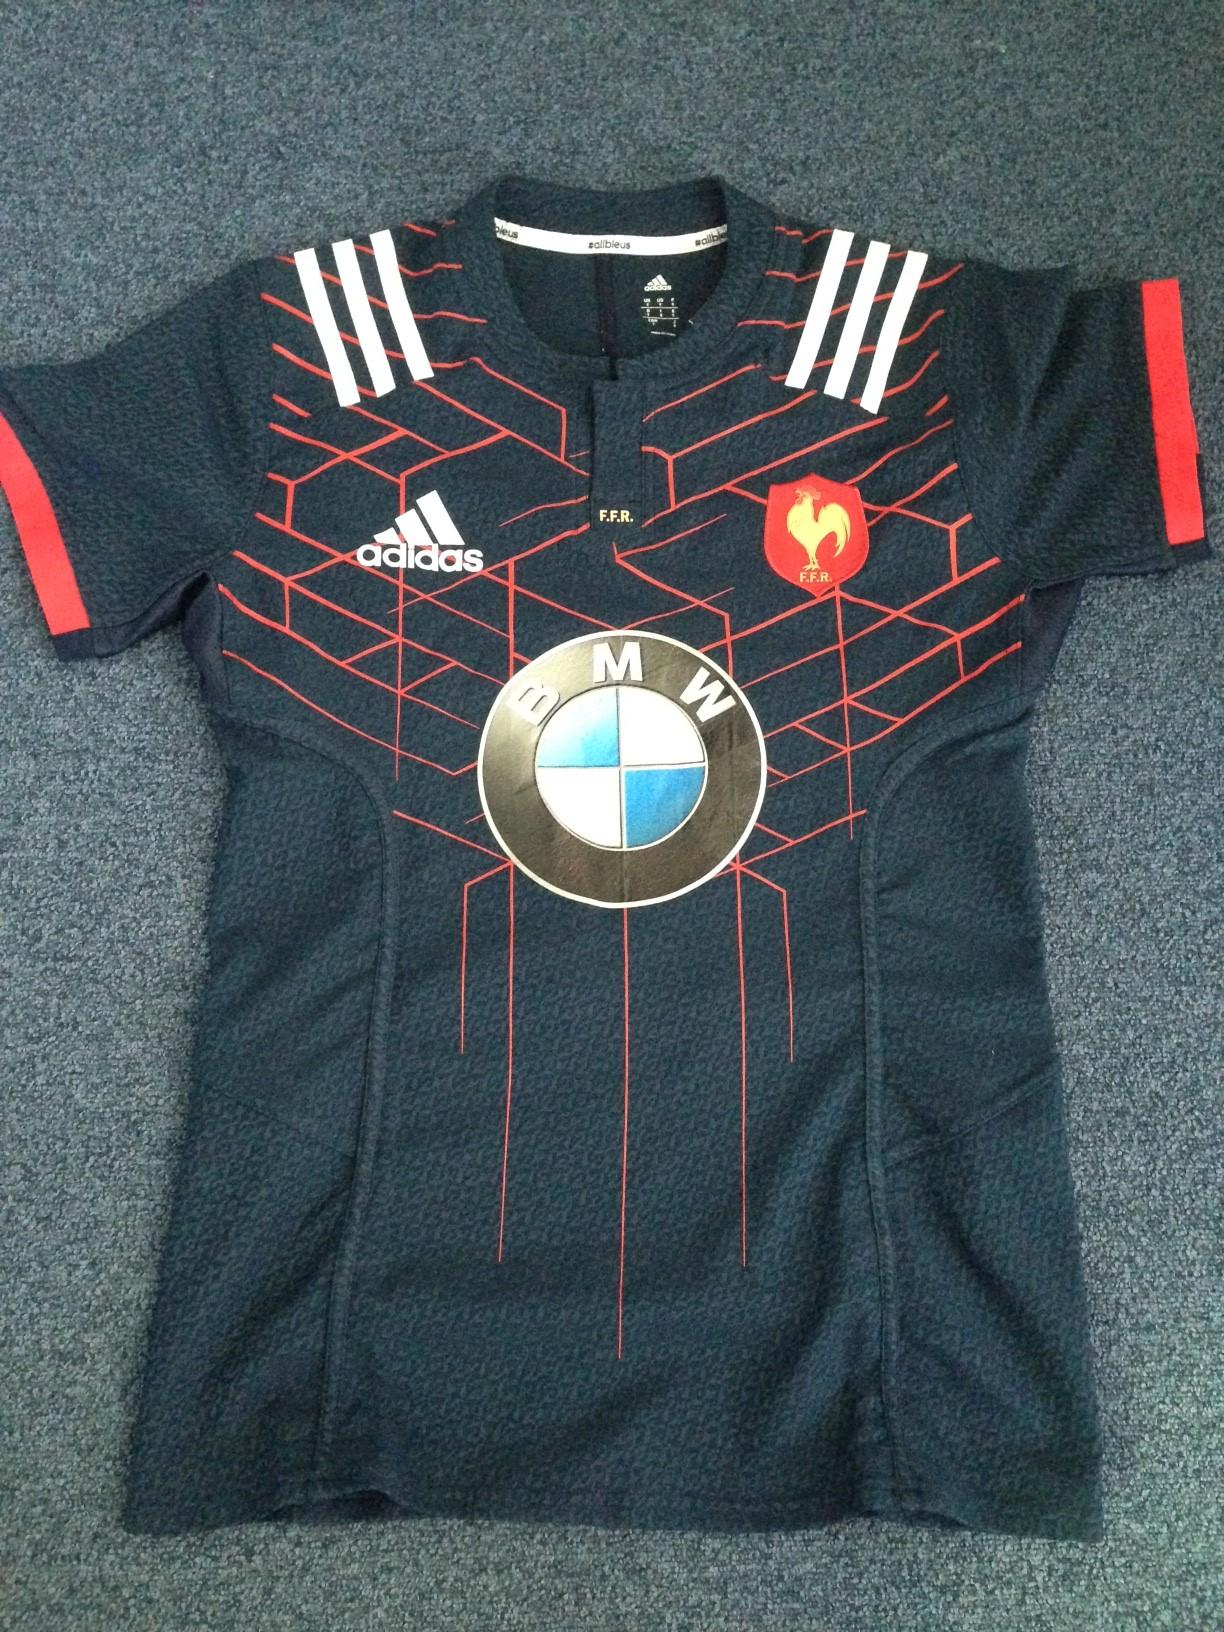 sponsor-maillot-bmw-rugby-equipe-de-france-20-ans